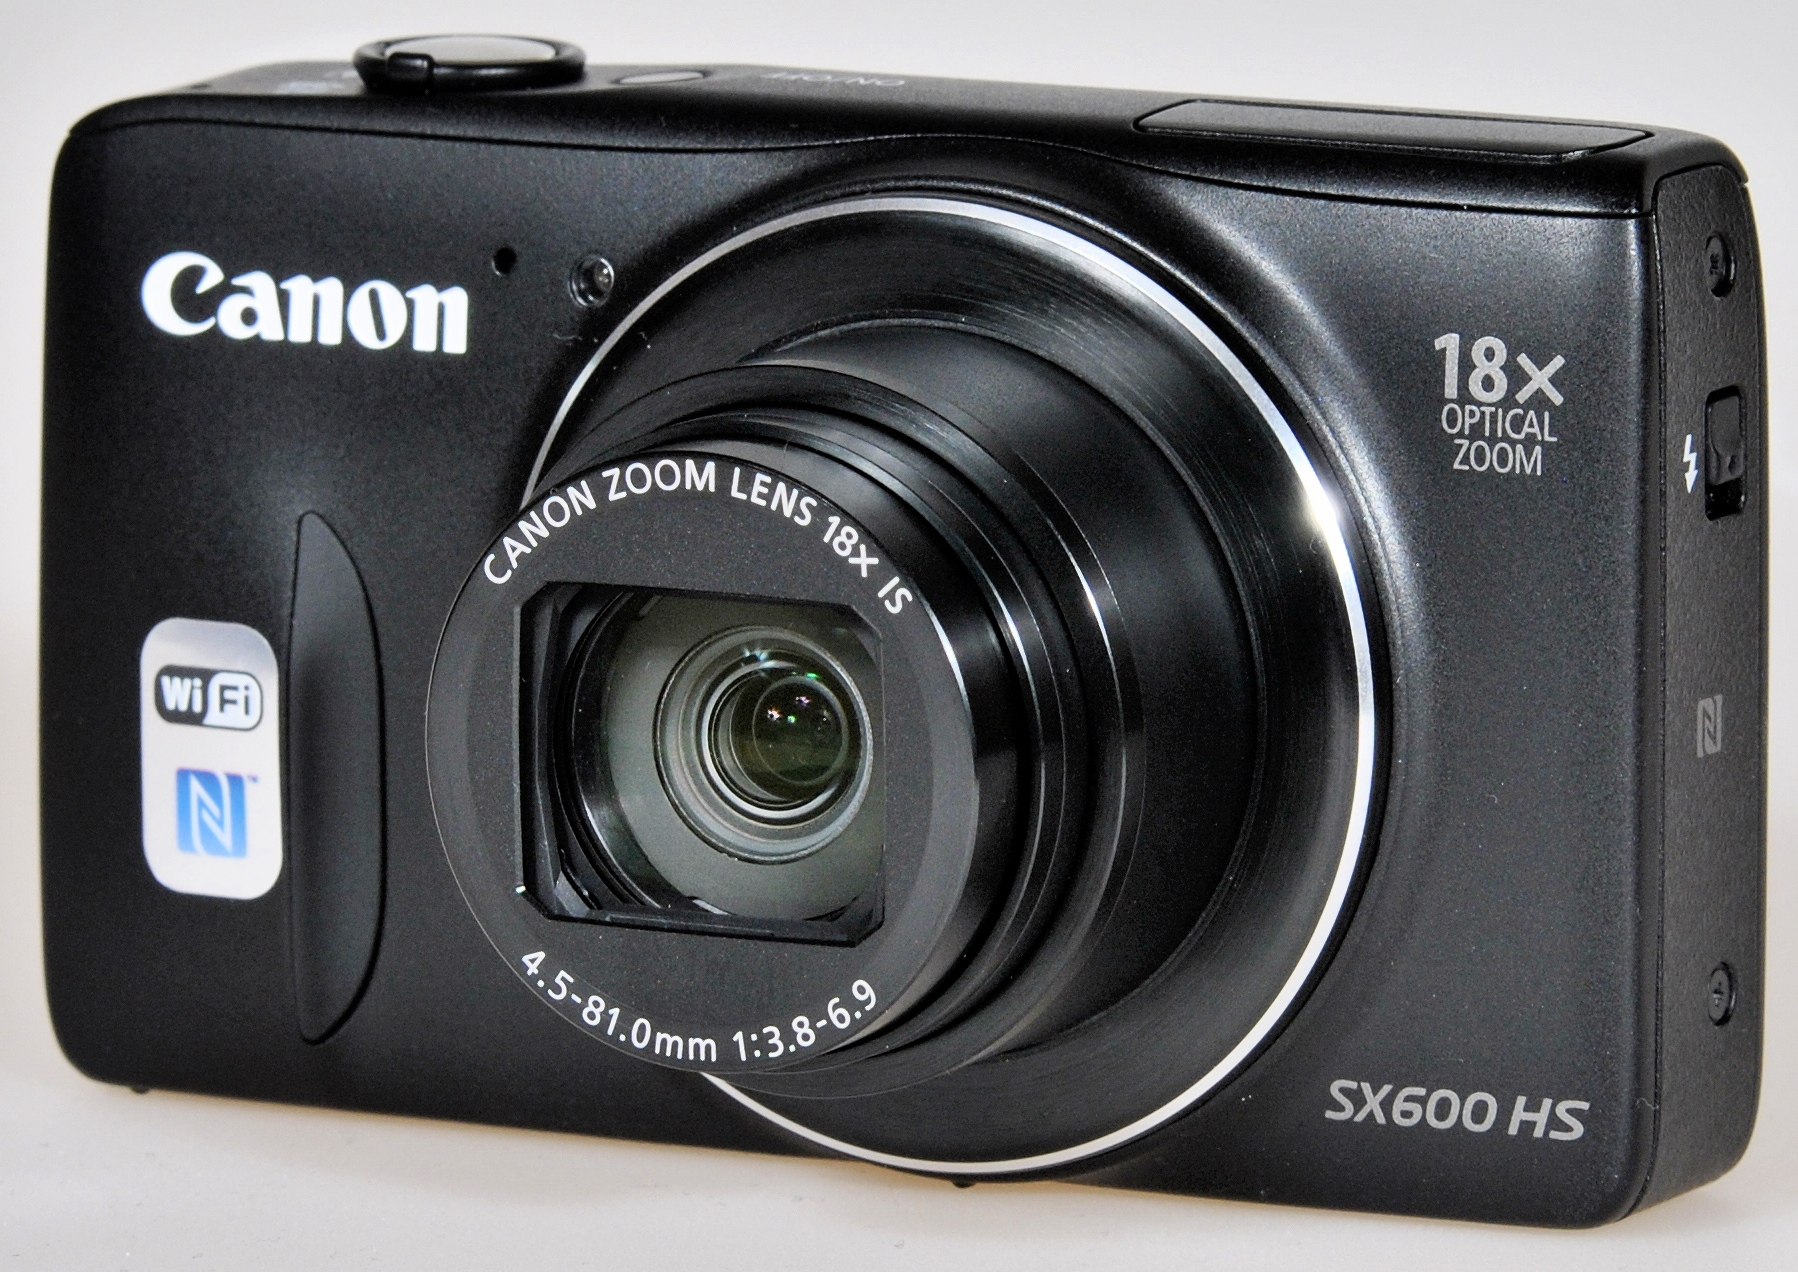 highres-canon-powershot-sx600-hs-.jpg